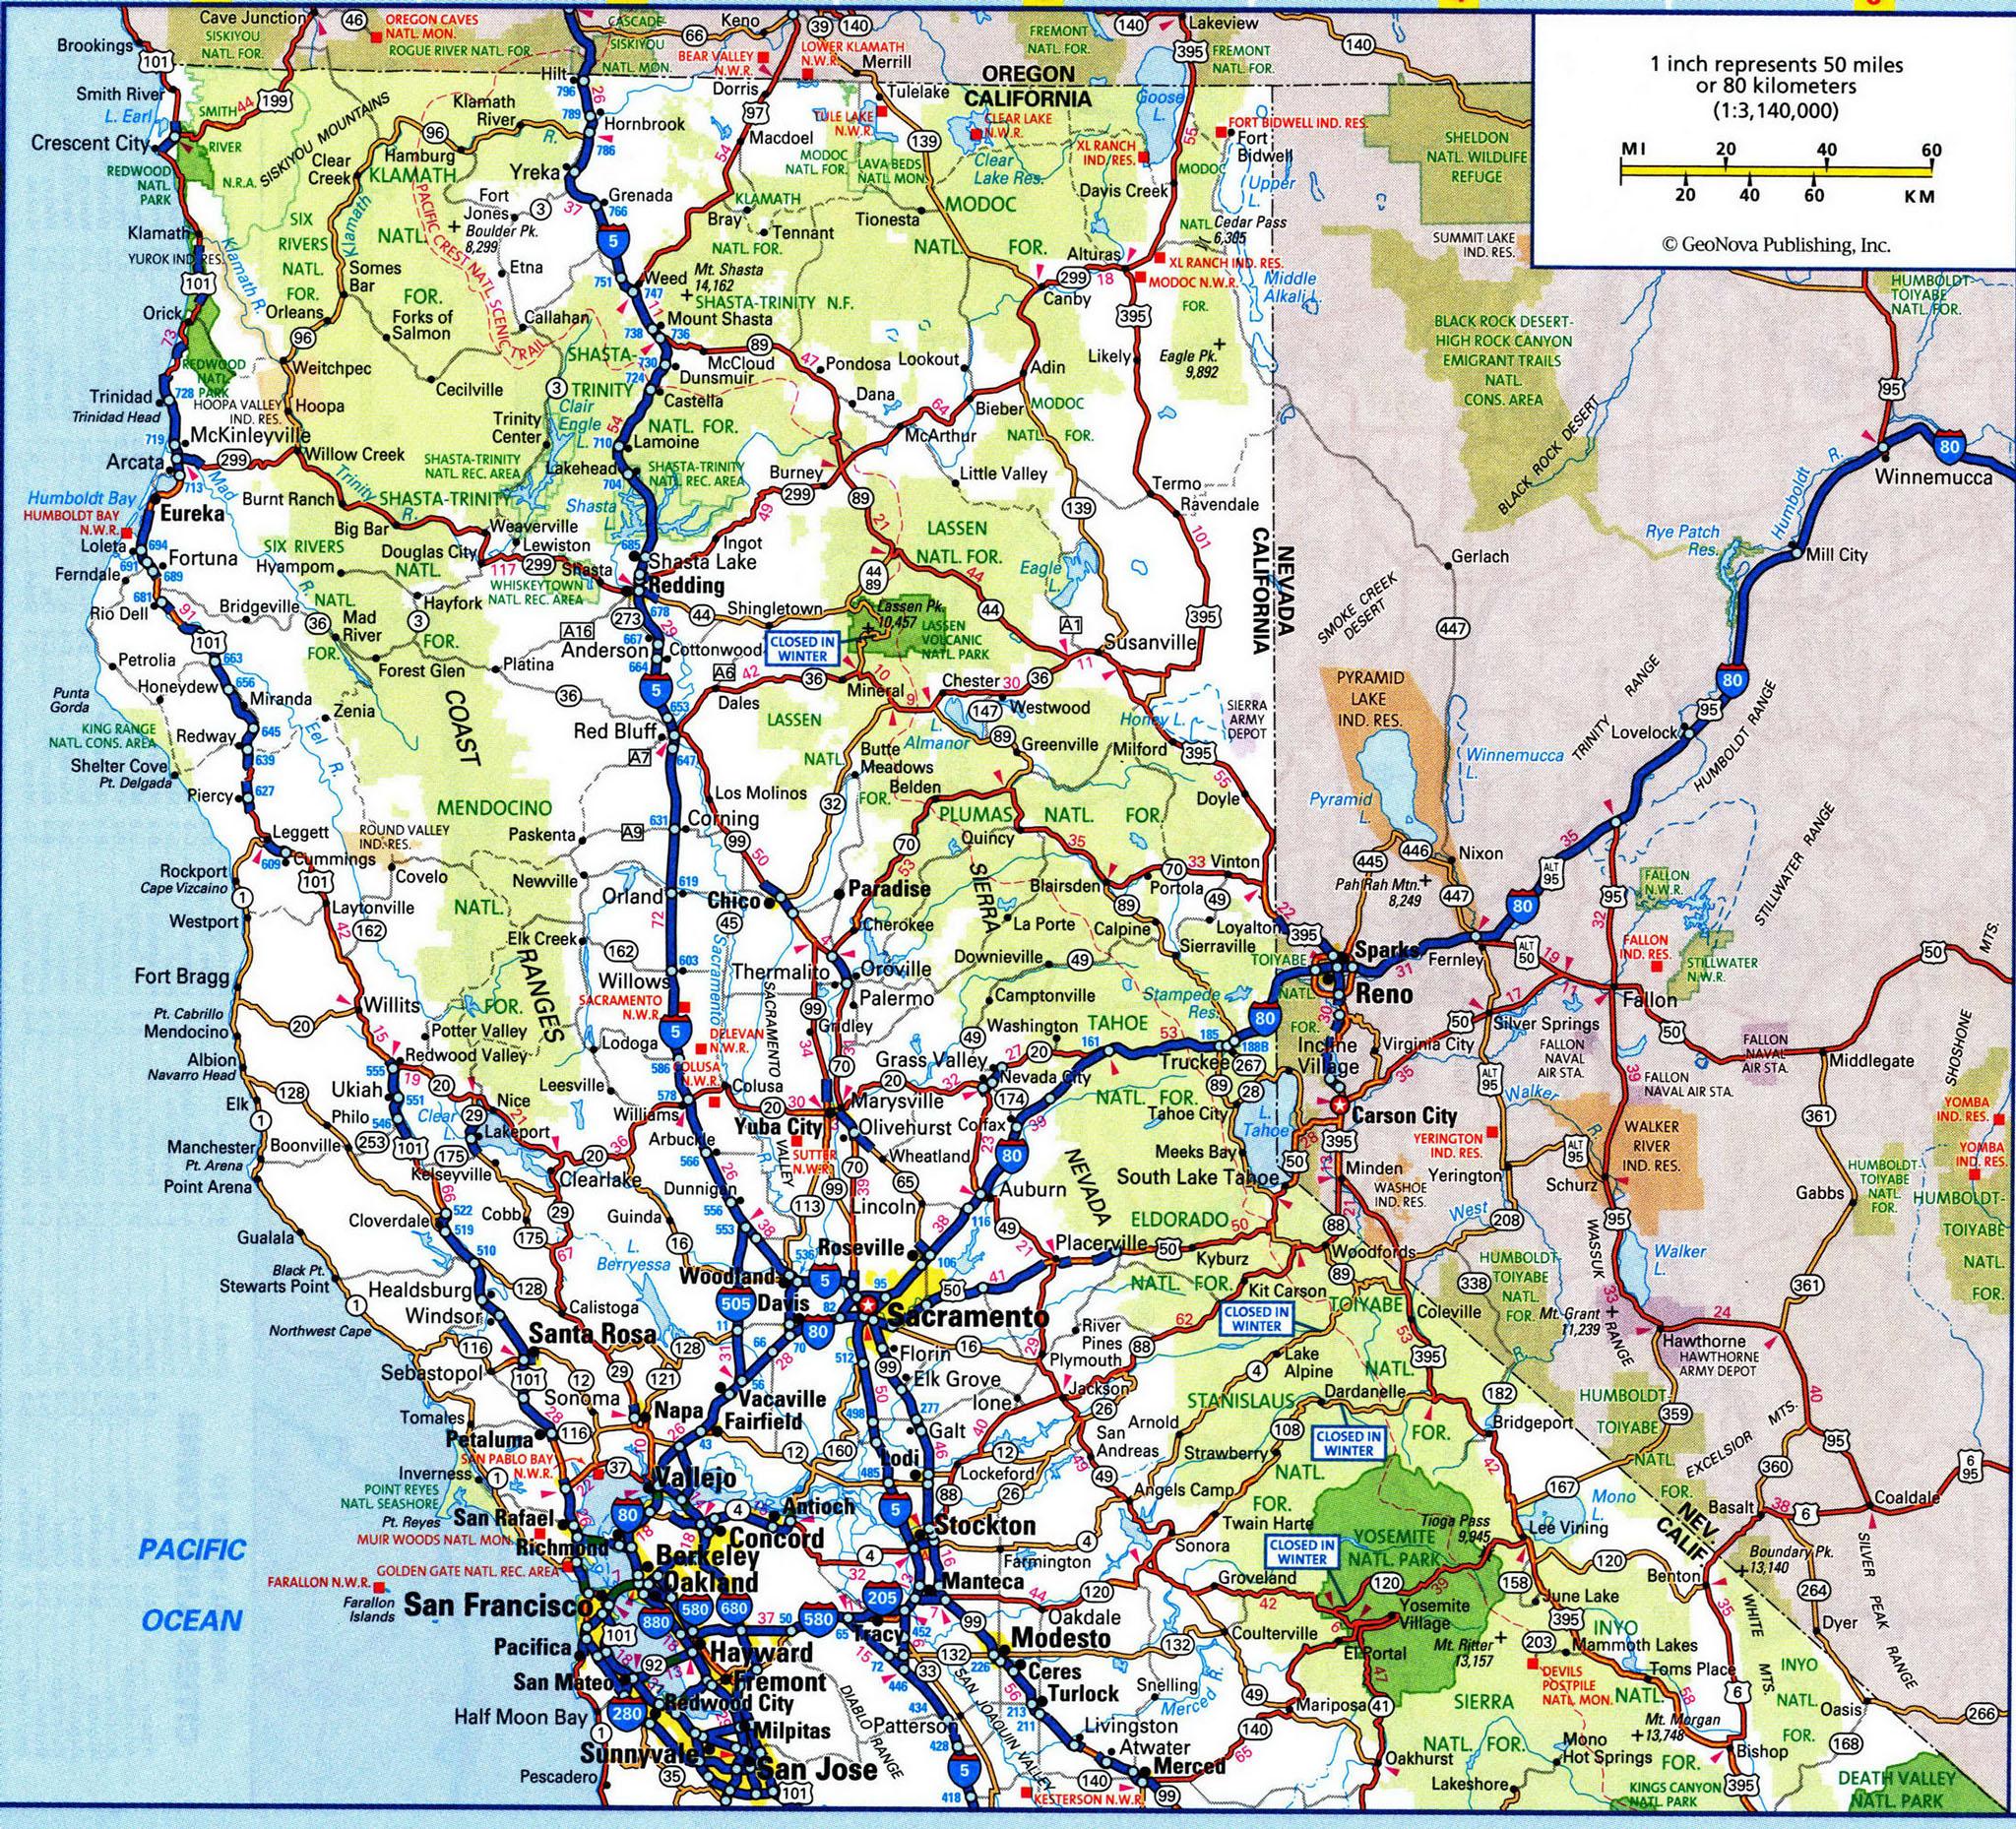 Map Of North California California River Map Northern California - Map Of Northern California